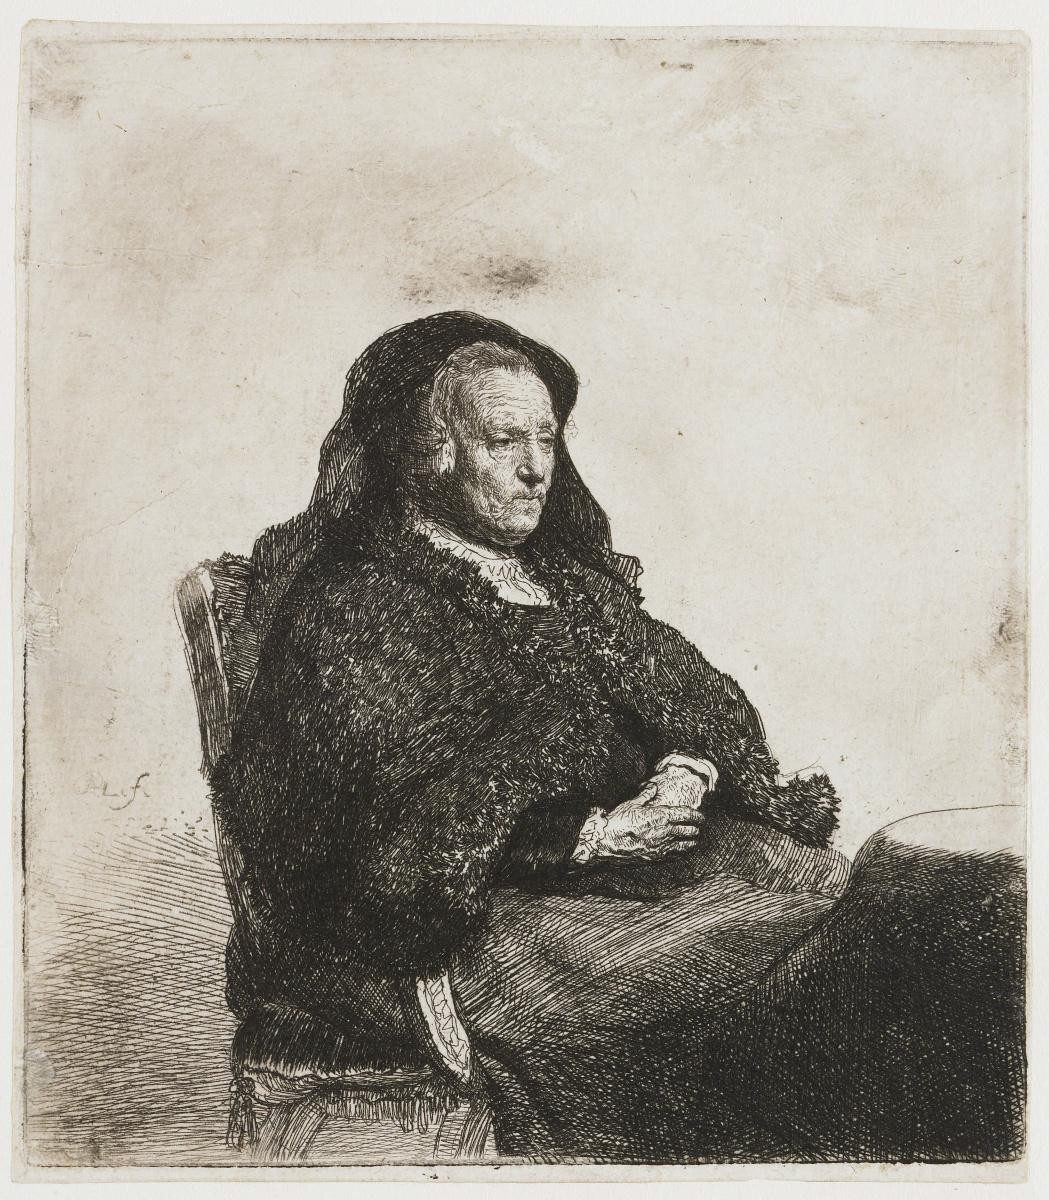 Рембрандт Харменс ван Рейн. Портрет матери за столом